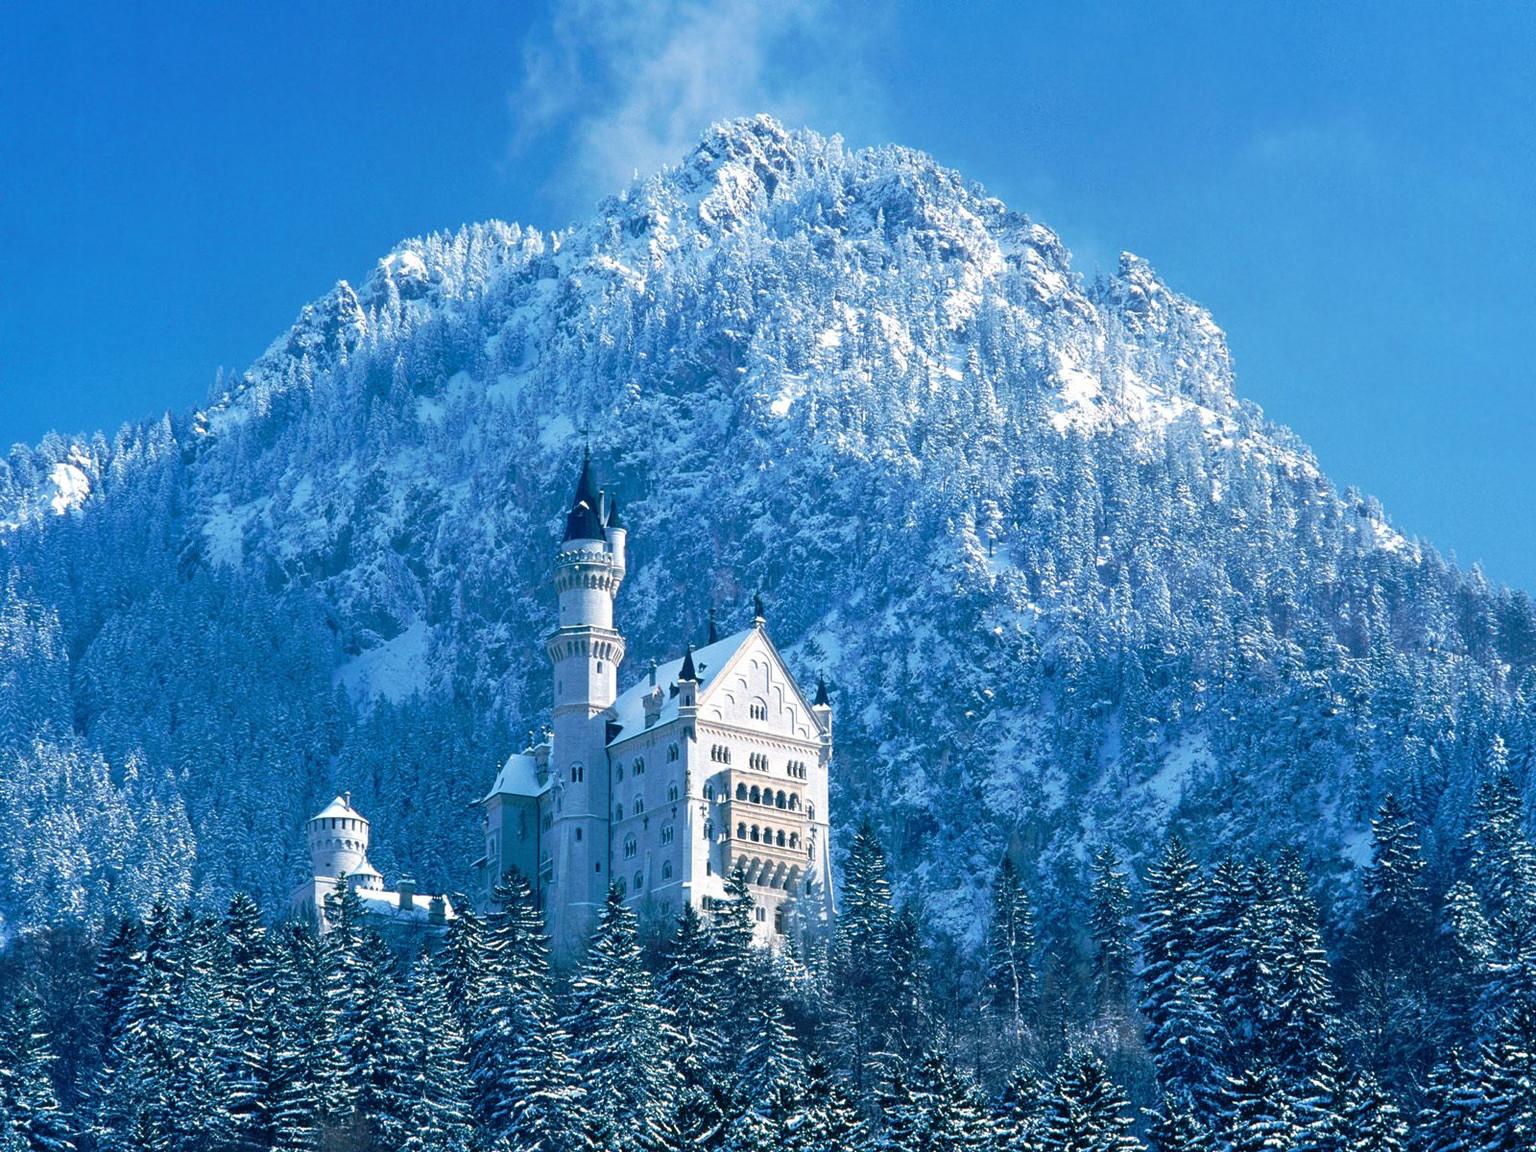 ws_Tall_winter_castle_1600x1200.jpg